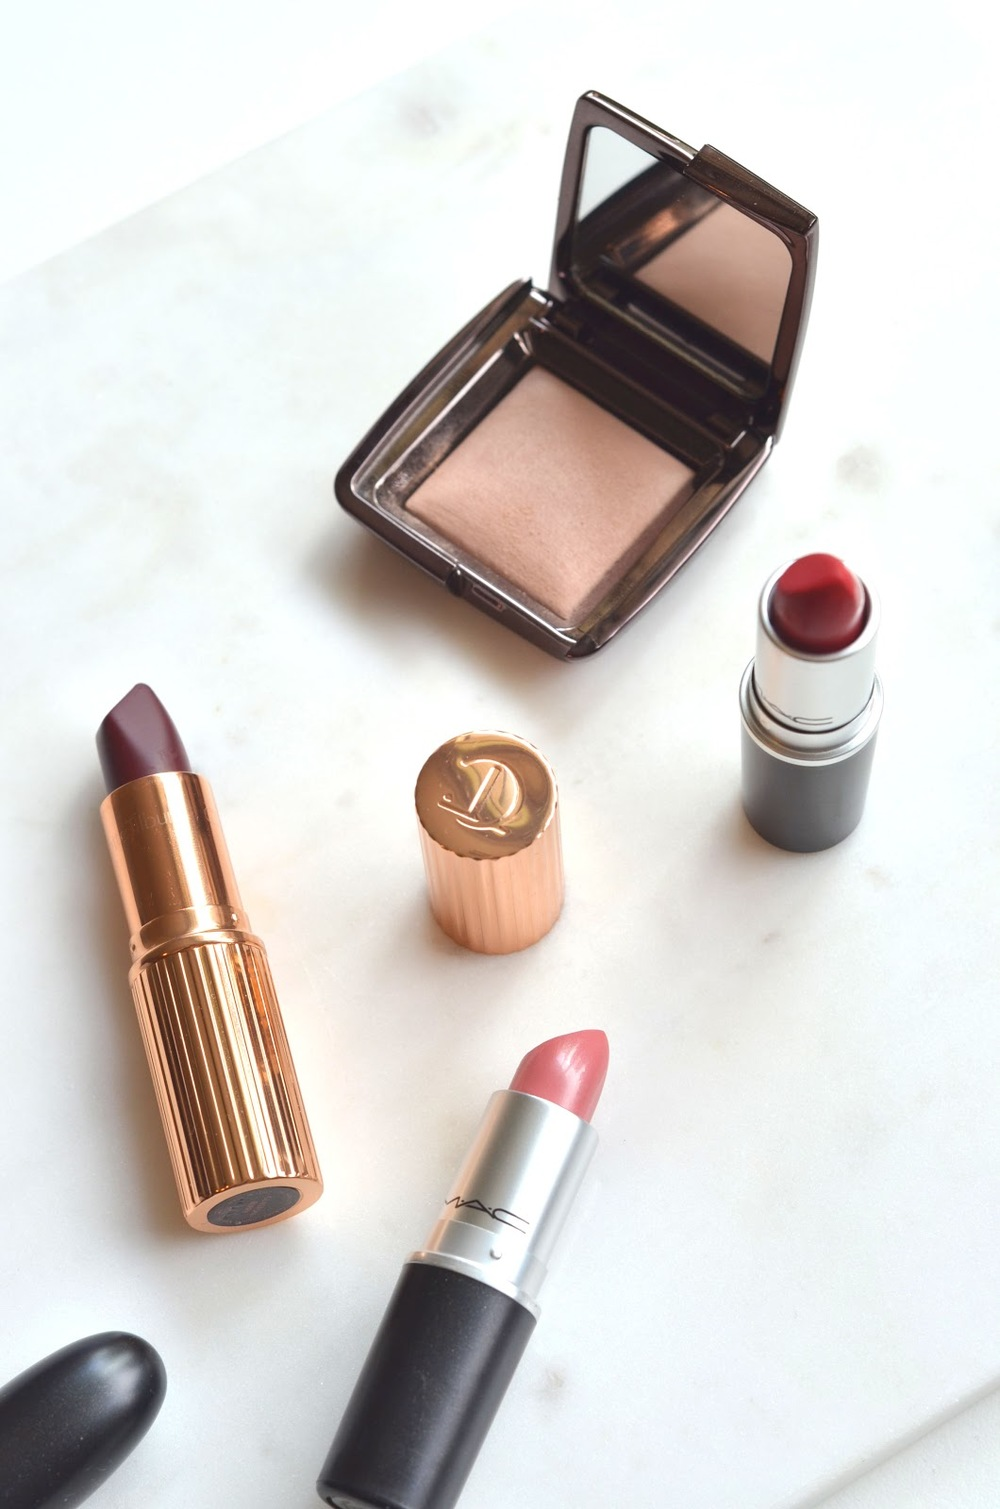 MAC Lipsticks, MAC Ruby Woo, MAC Peach Blossom, Hourglass Ambient Powder, Hourglass Dim Light, Charlotte Tilbury, Charlotte Tilbury Glastonberry, Charlotte Tilbury Matte Revolution Lipsticks